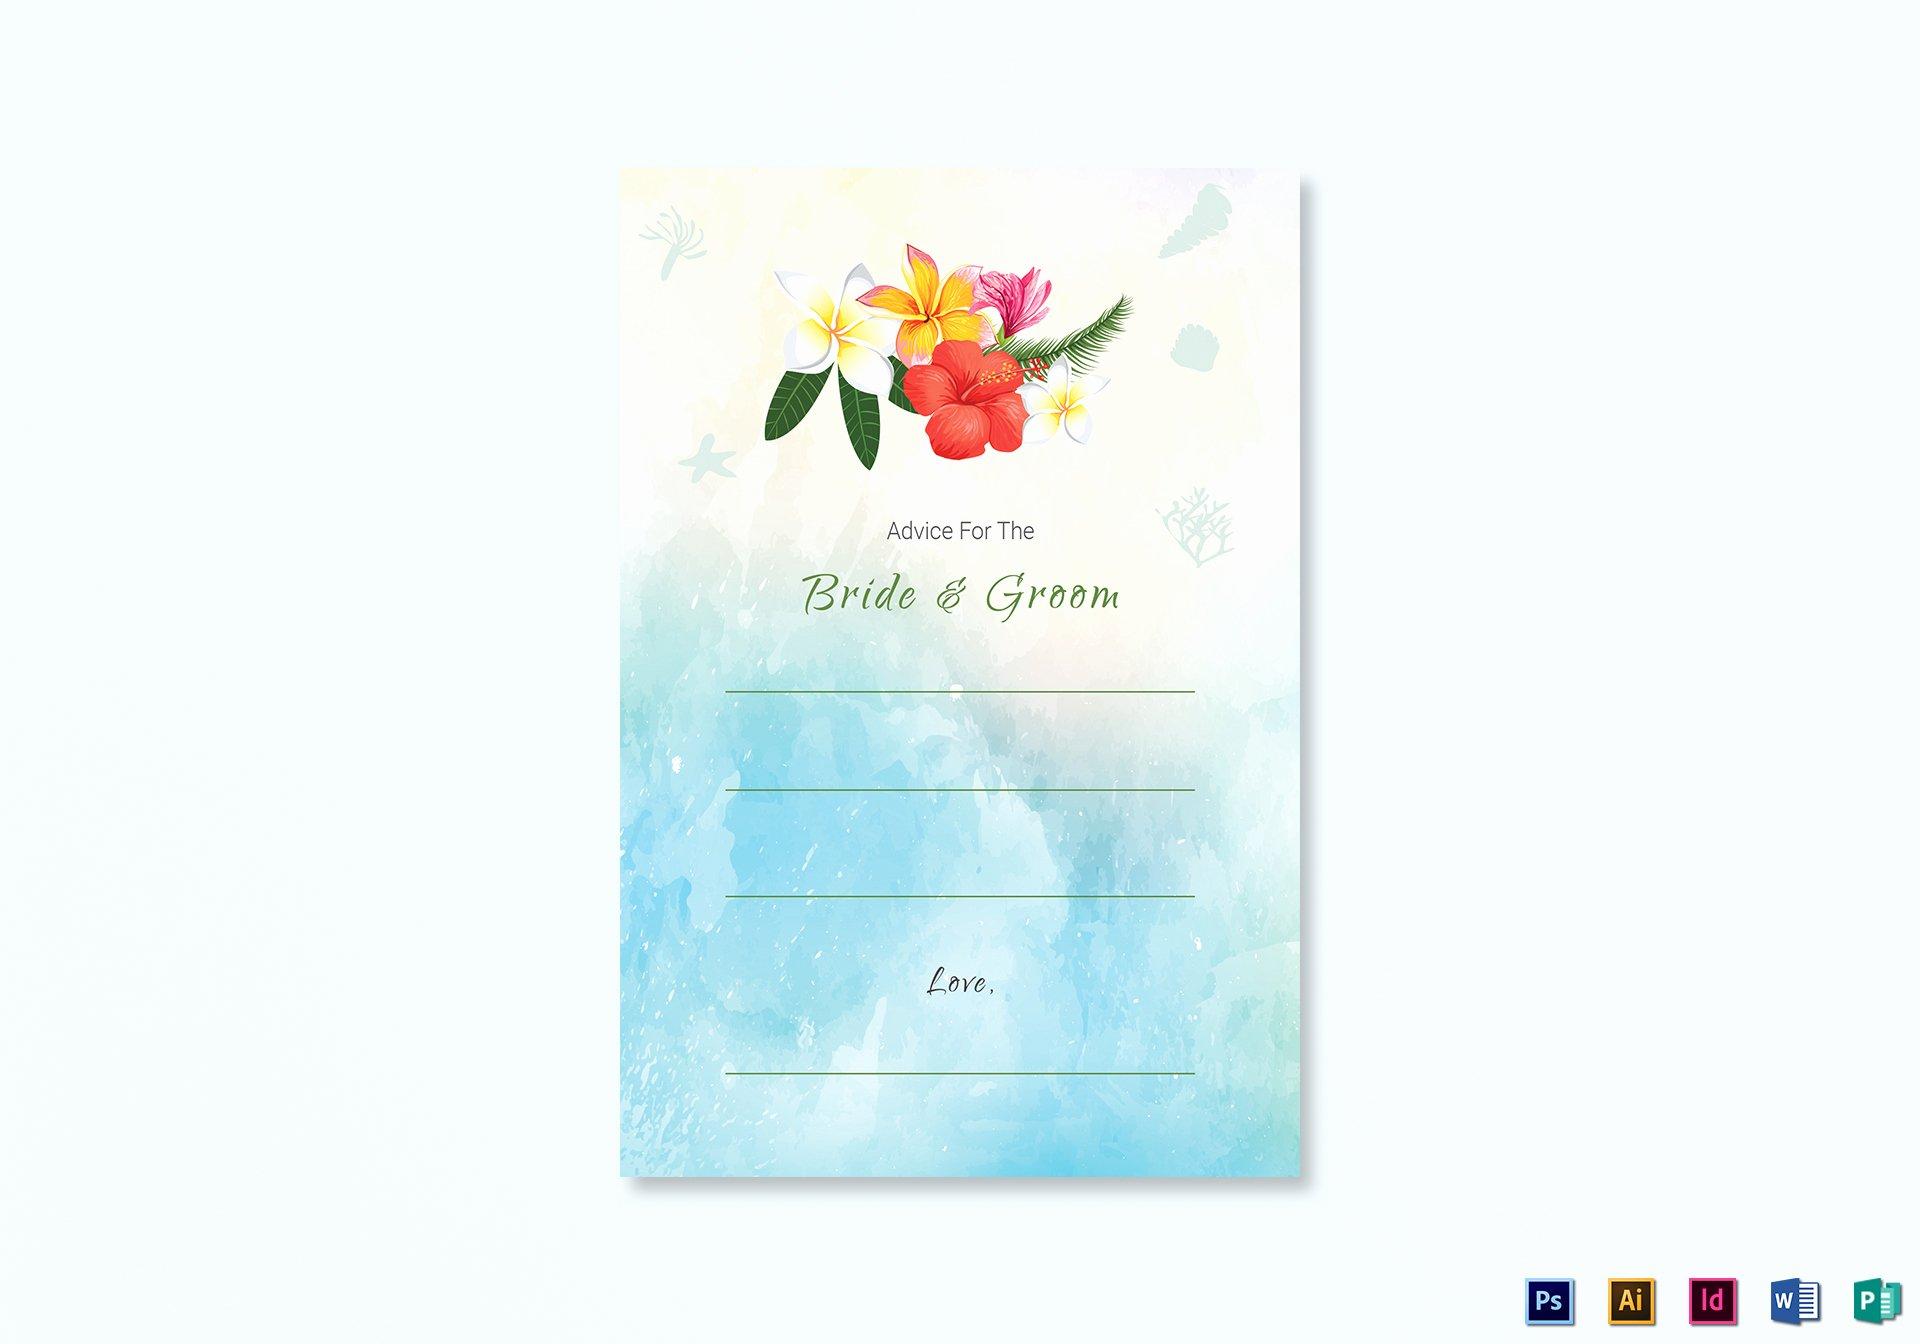 Wedding Advice Cards Template Luxury Beach Wedding Advice Card Template In Psd Word Publisher